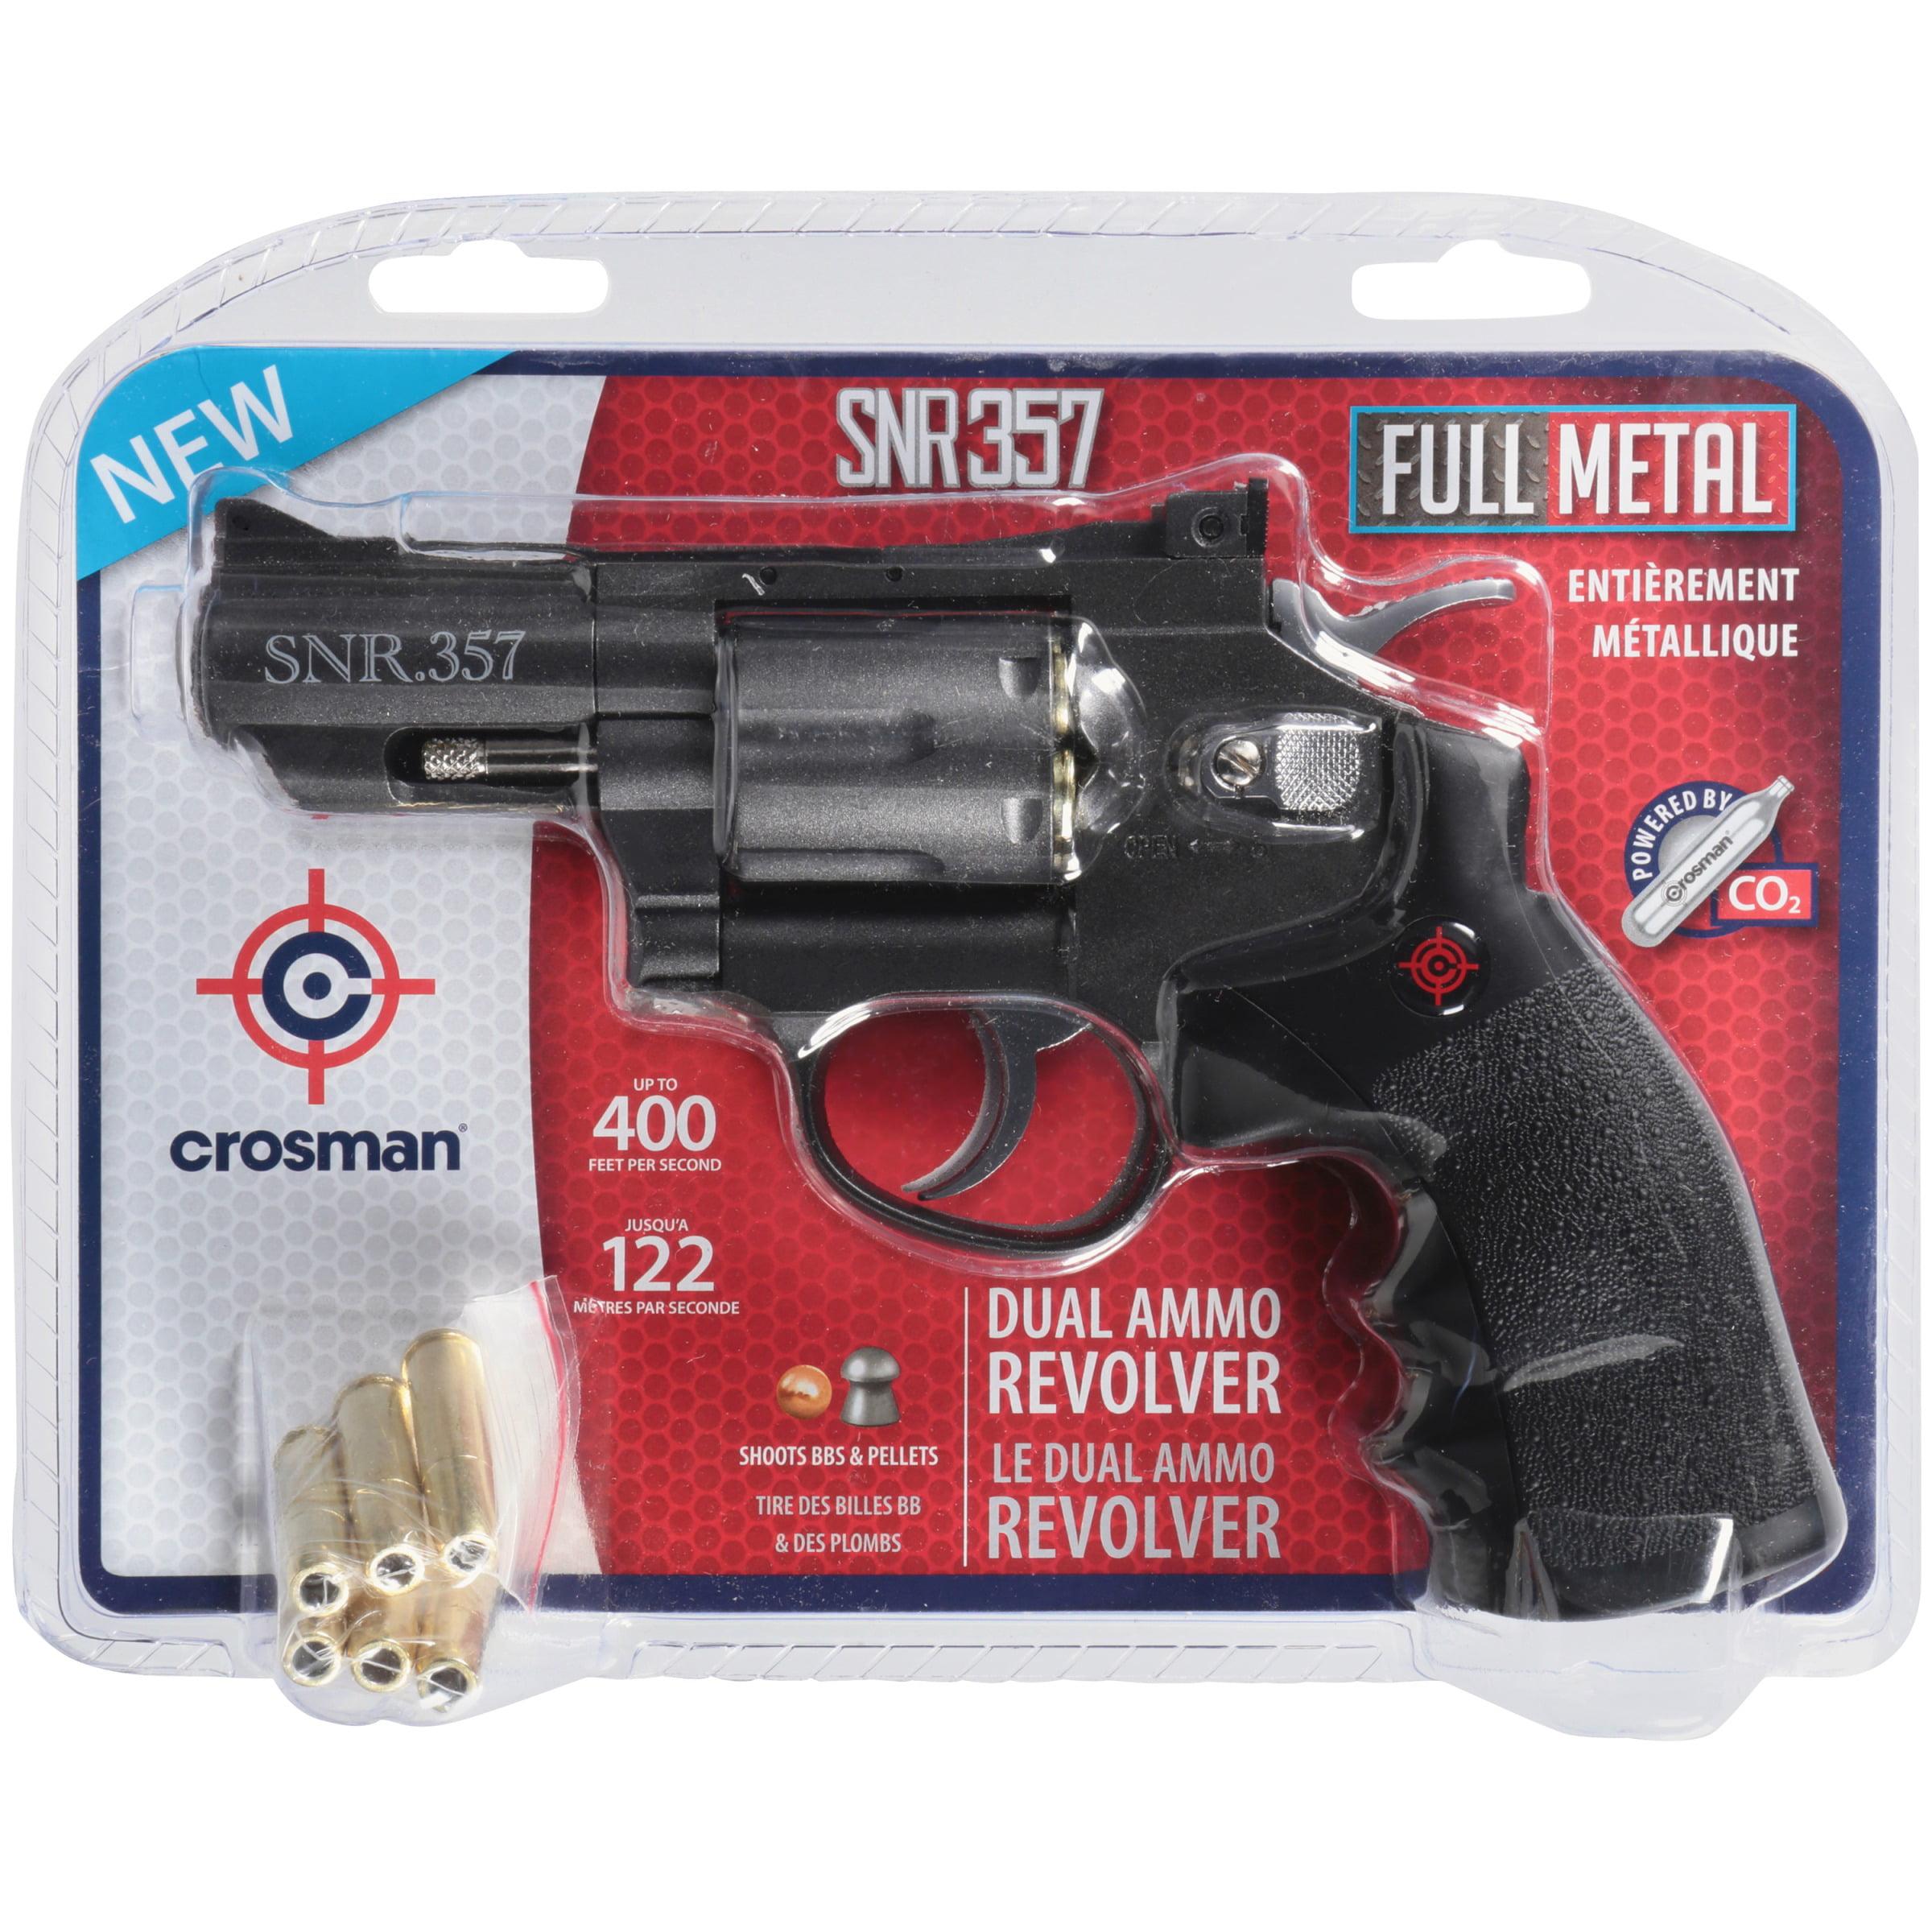 Crosman SNR357 Full Metal Dual Ammo Snub Nose C02 Air Revolver,  177